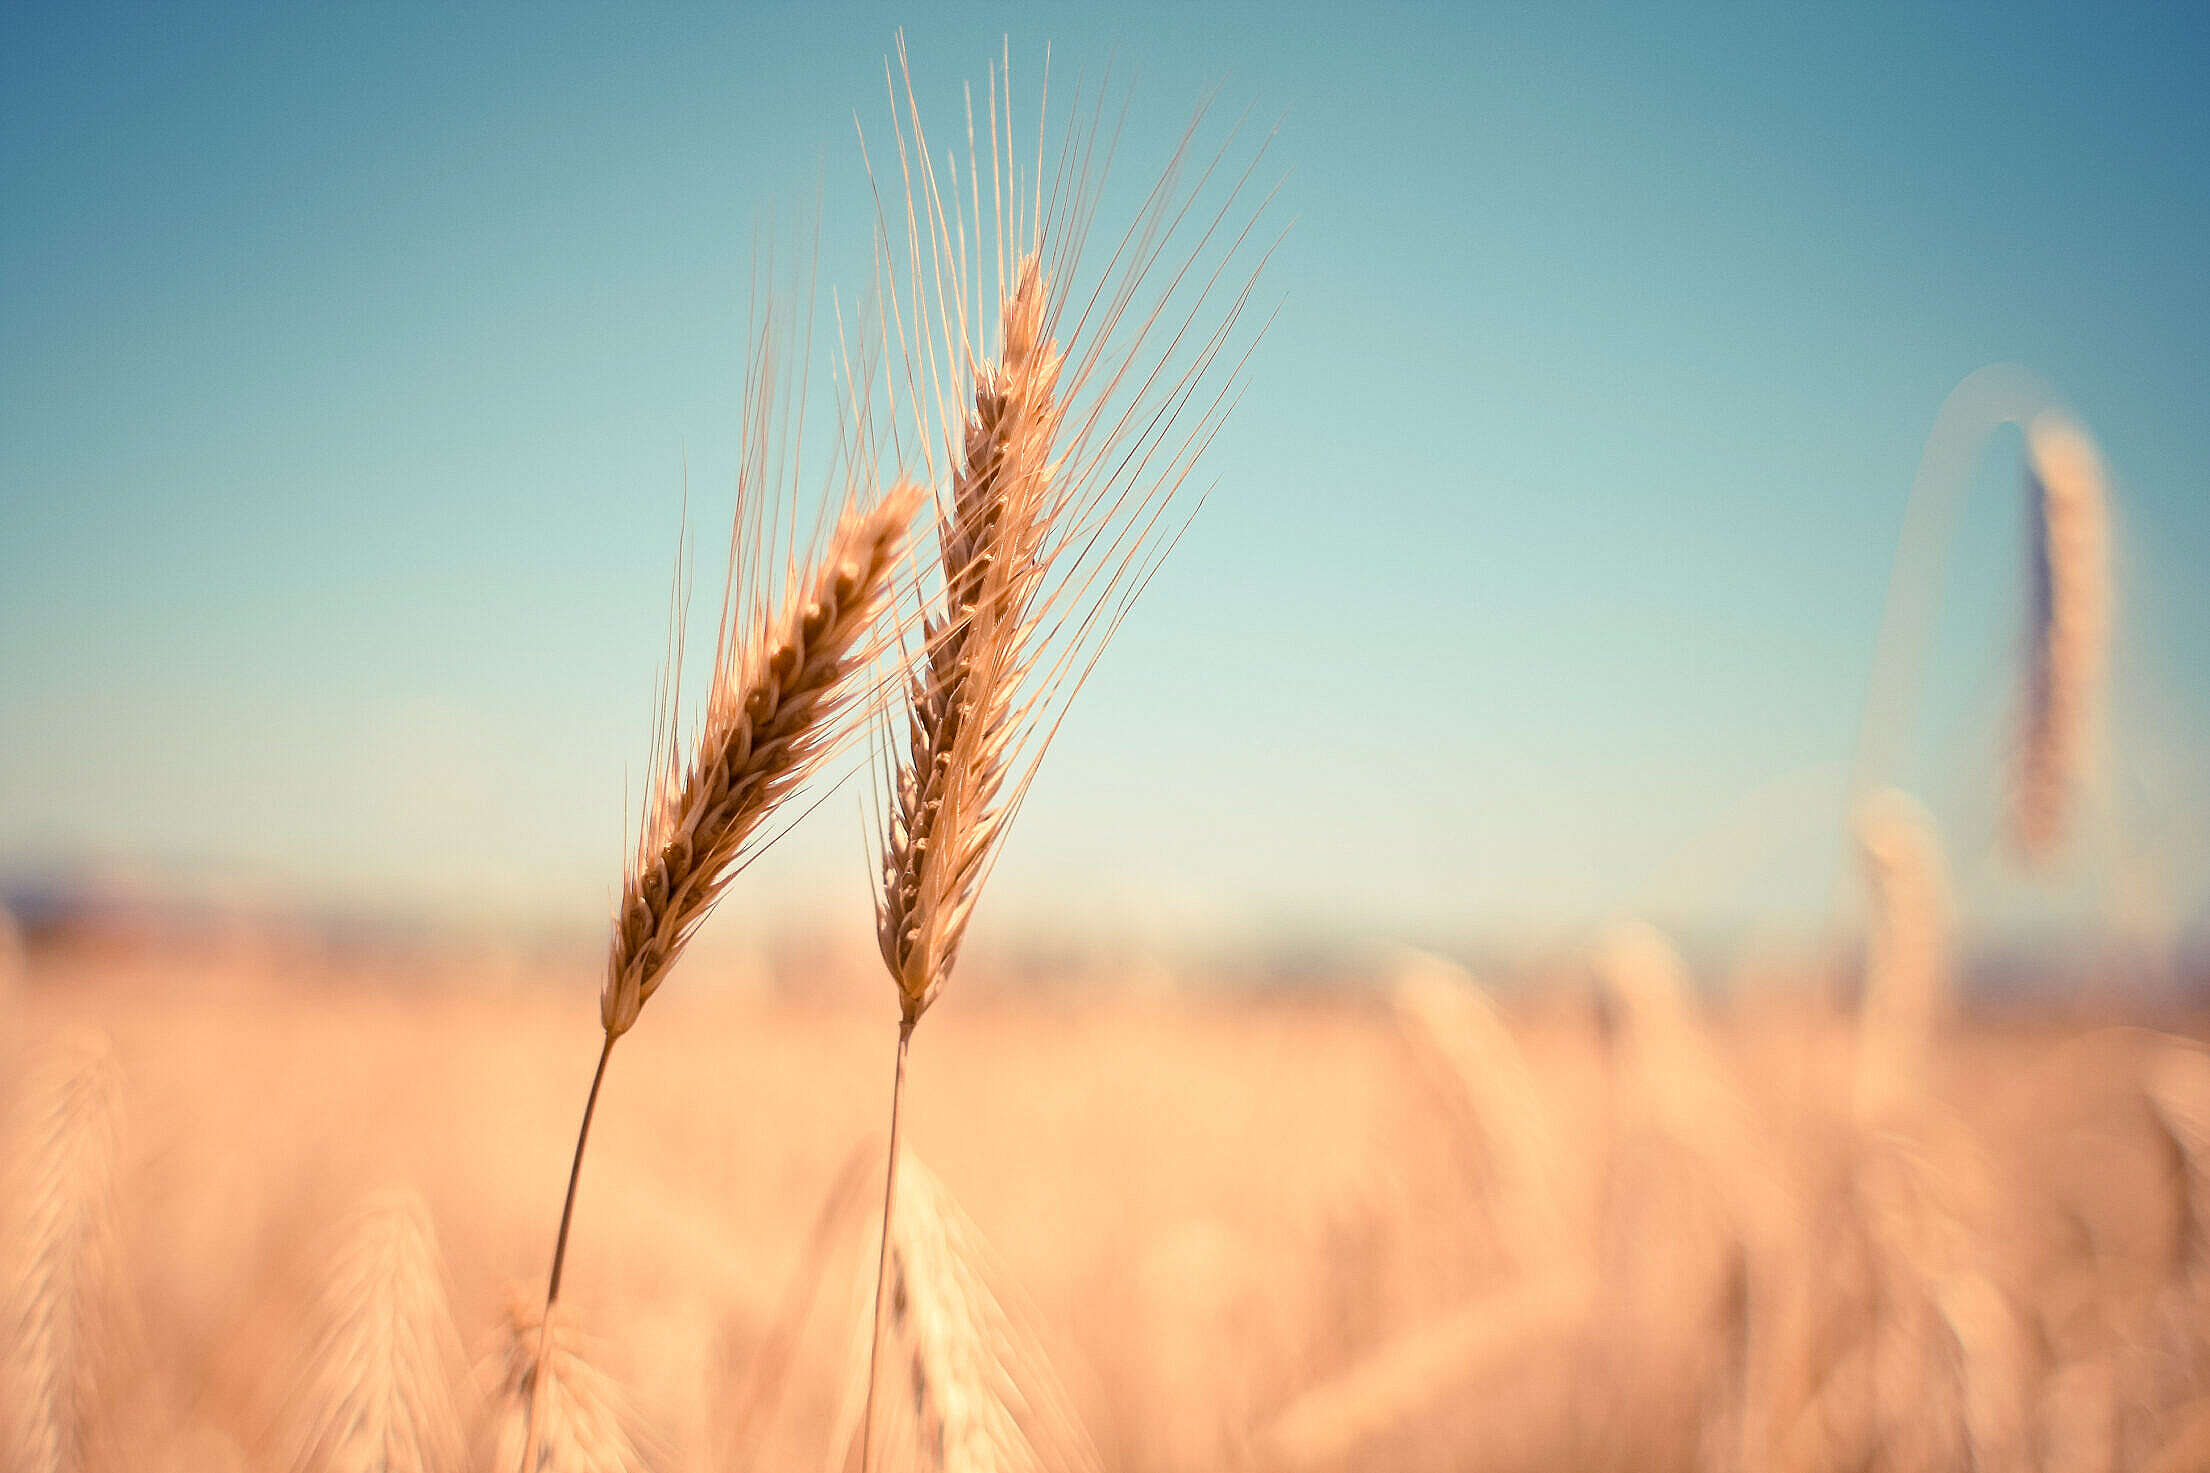 Grain Field Detail Free Stock Photo